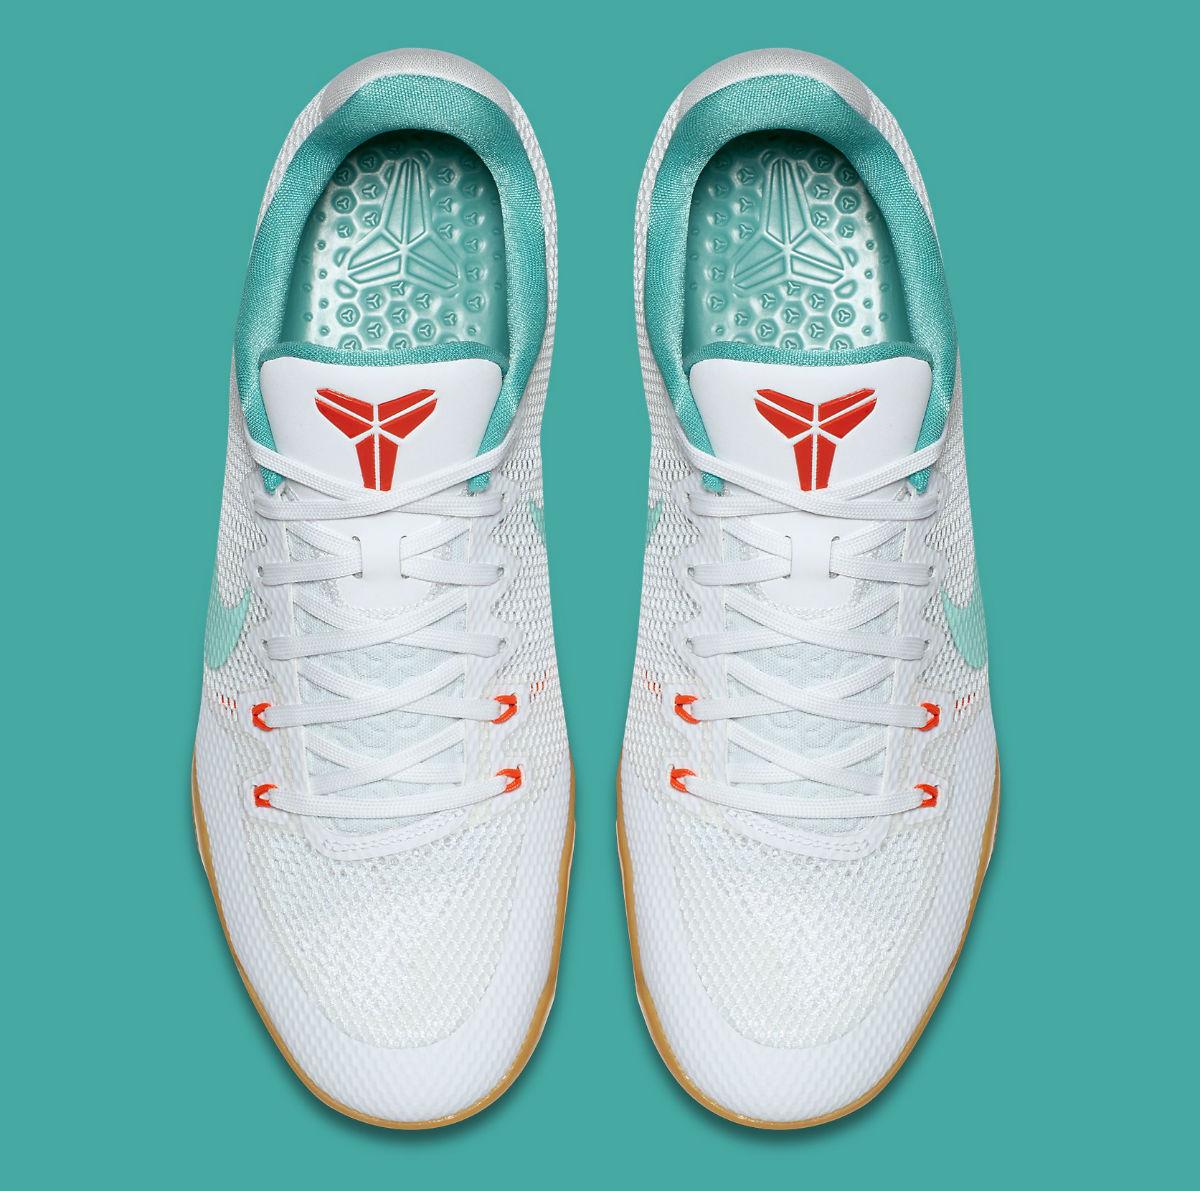 Nike Kobe 11 Summer Pack Release Date Top 836183-103